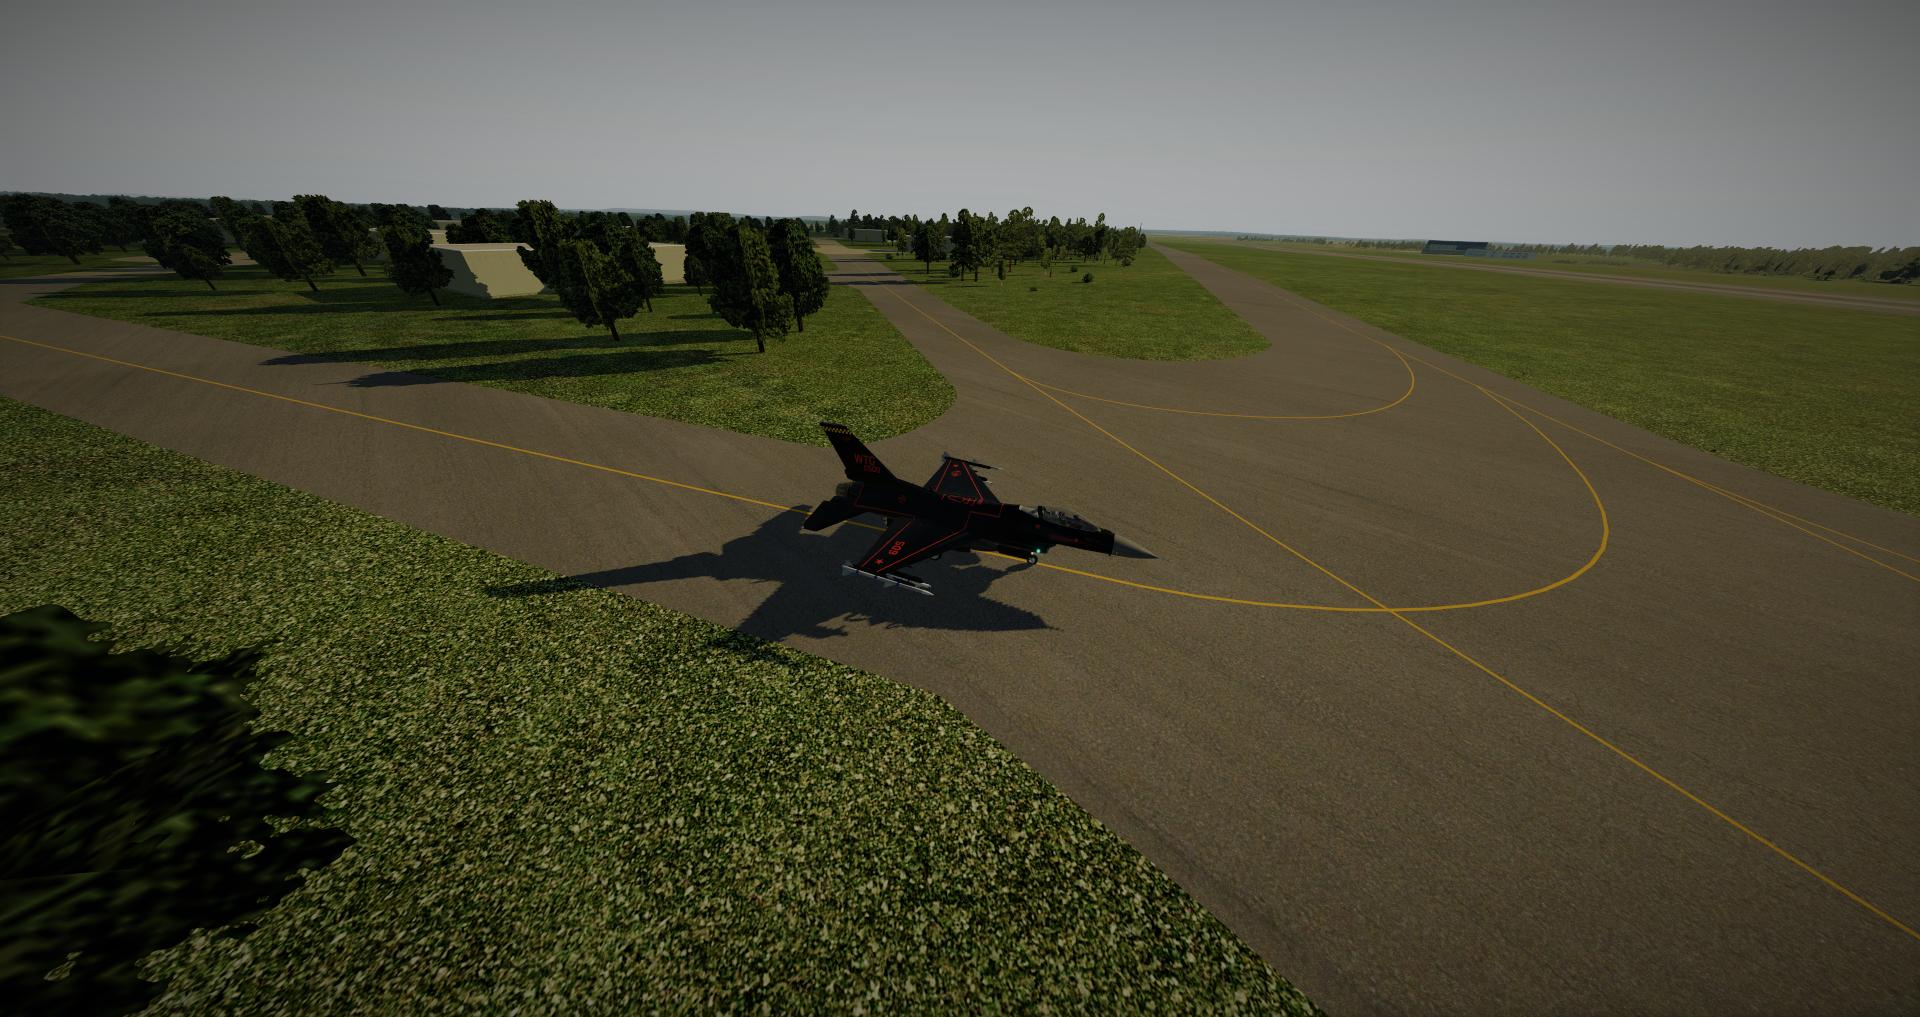 F_16 - 2021-01-22 11.09.34